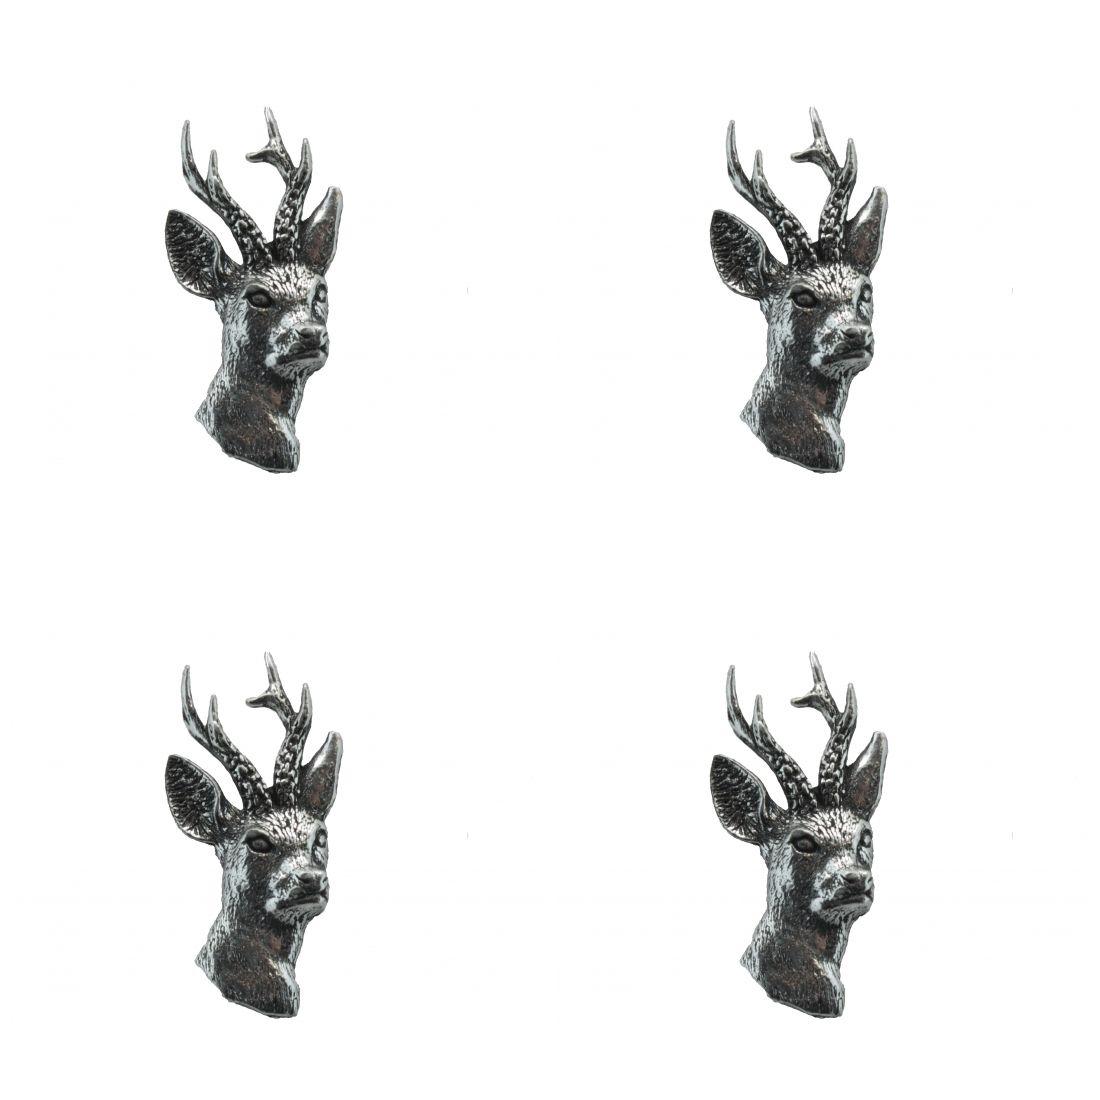 4 x Pin Anstecker Badge Reh Kopf, 1,7x3,2cm